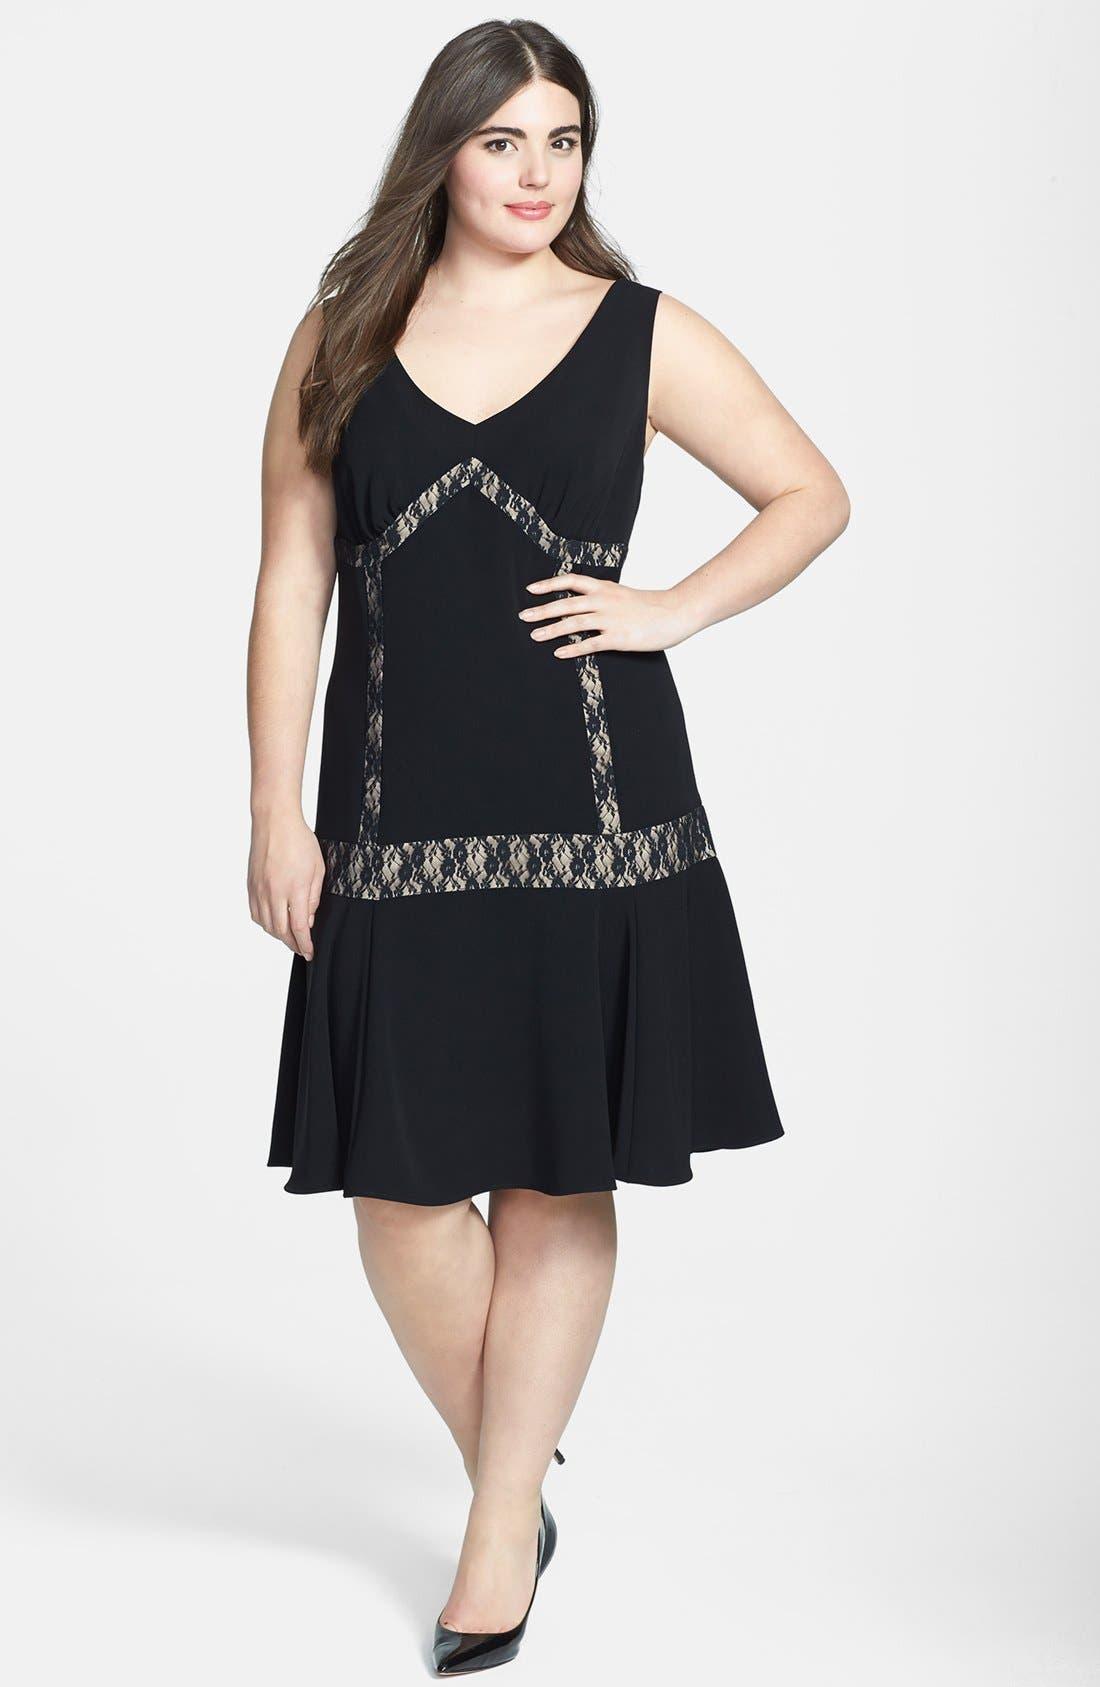 Alternate Image 1 Selected - ABS by Allen Schwartz Lace Inset Drop Waist Dress (Plus Size)